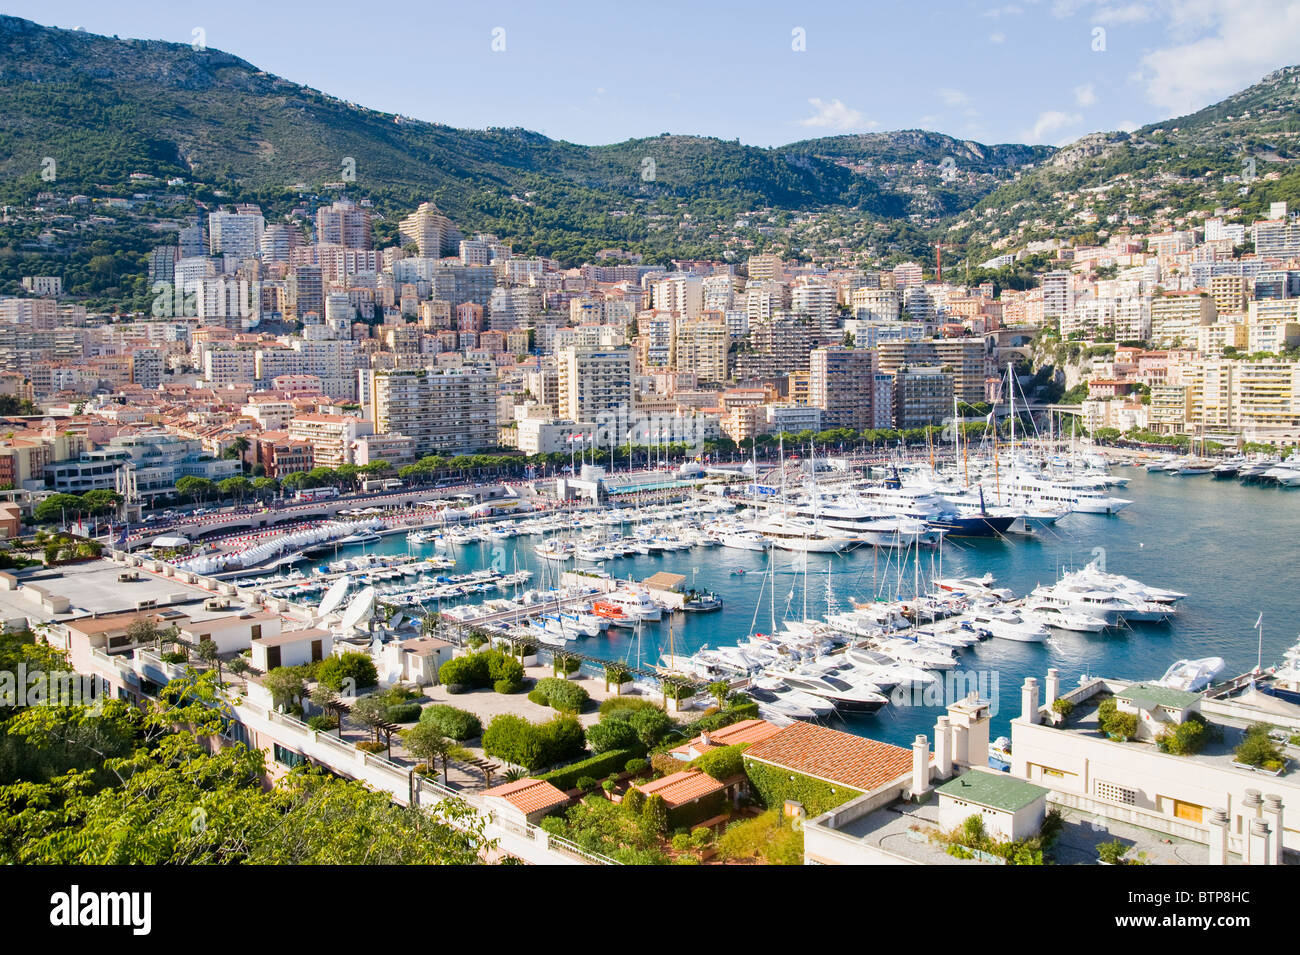 La Condamine, Monaco harbour, Monaco - Stock Image